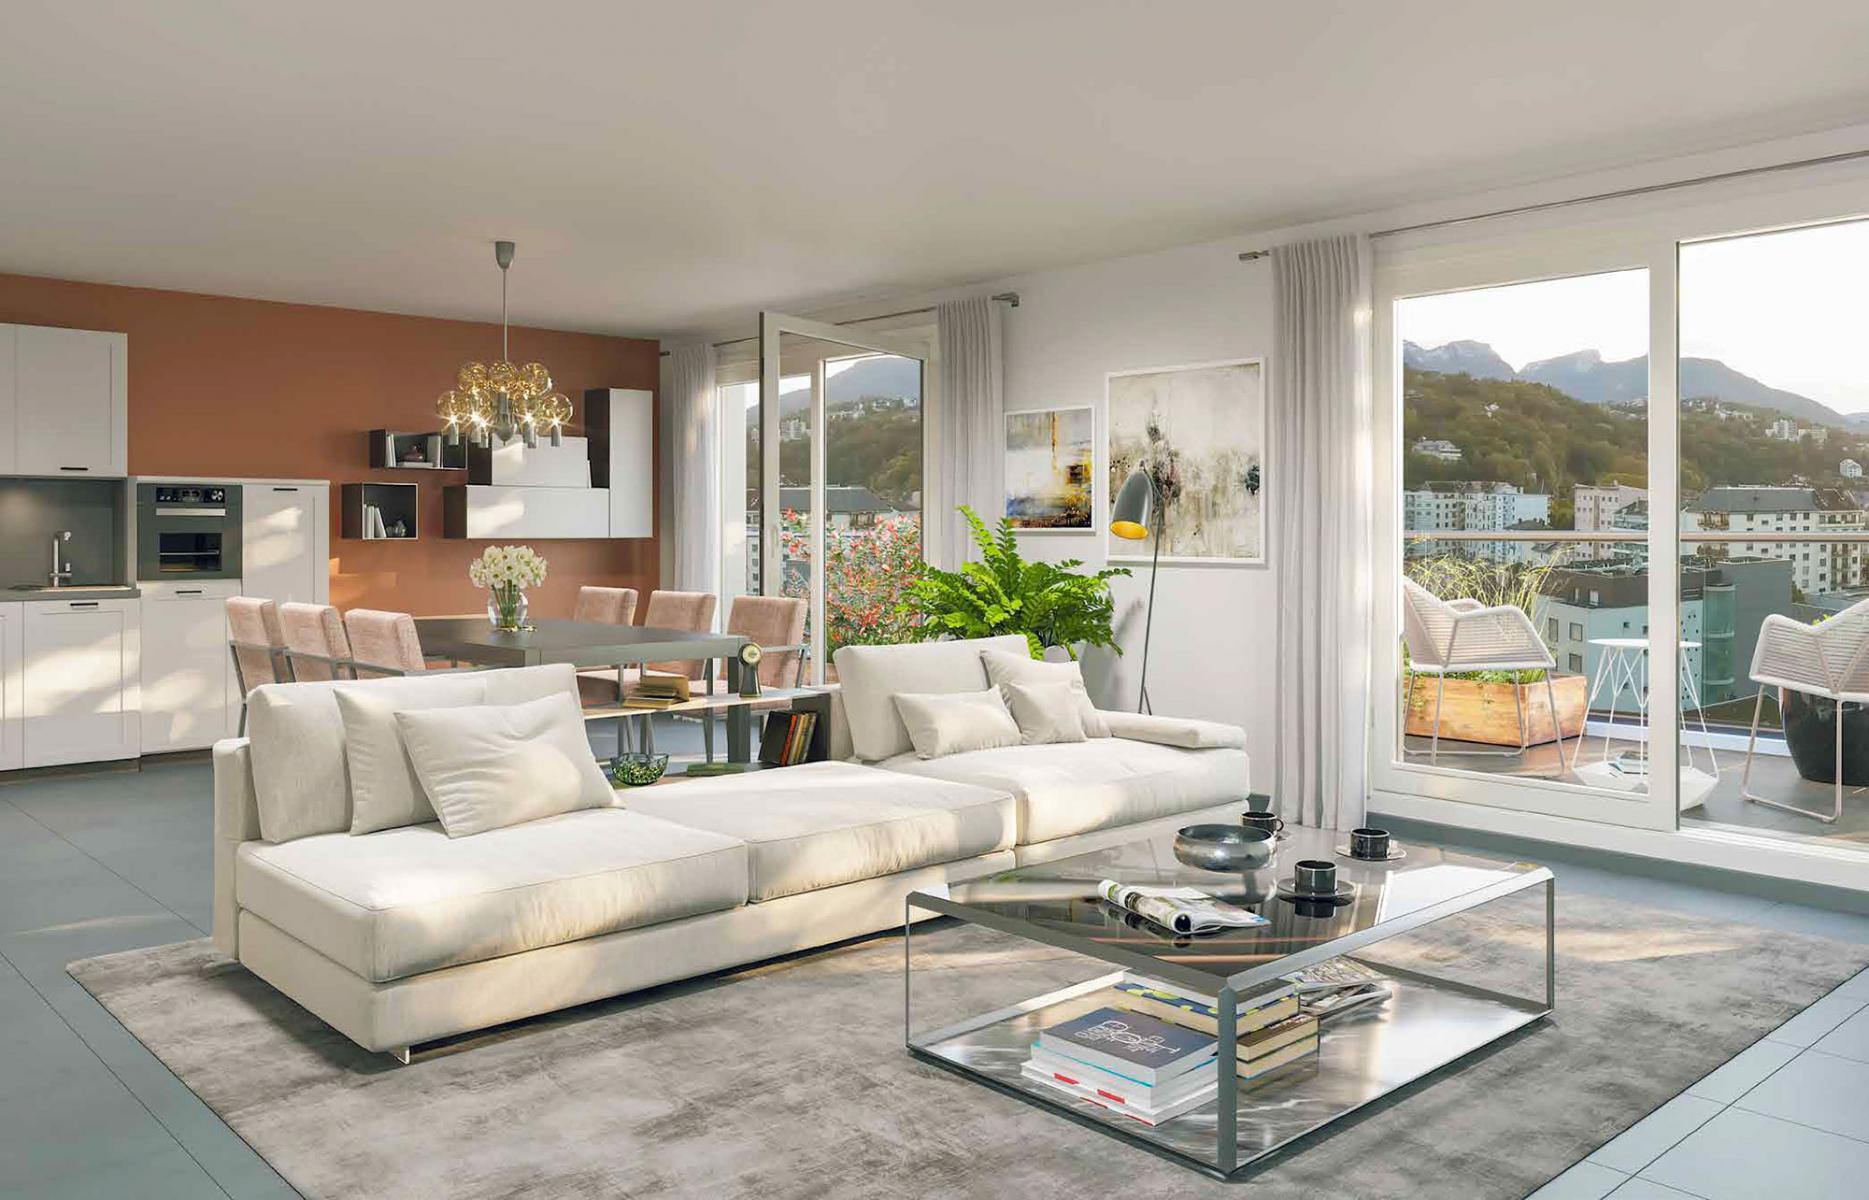 Programme immobilier Chambery (73000) Proche Quai de la Rize ICA2